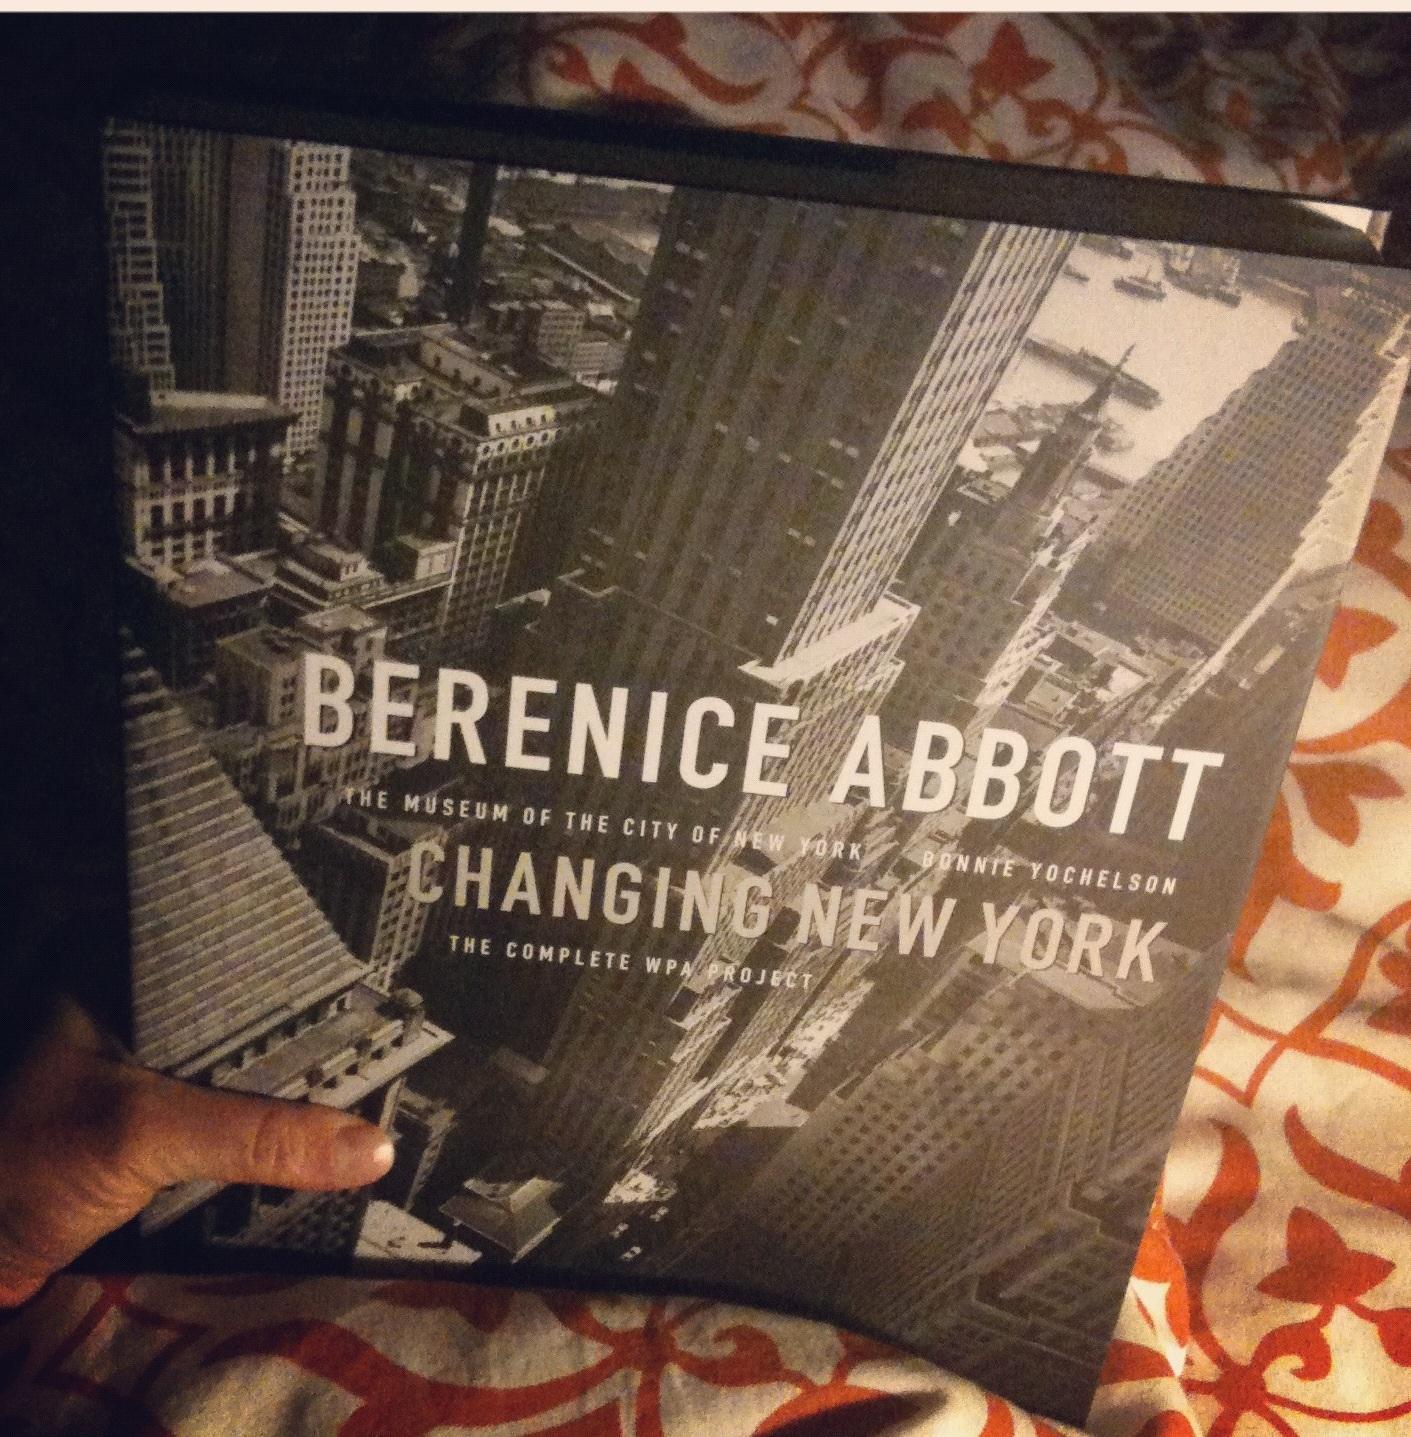 Berenice Abbott – Accidental photographer